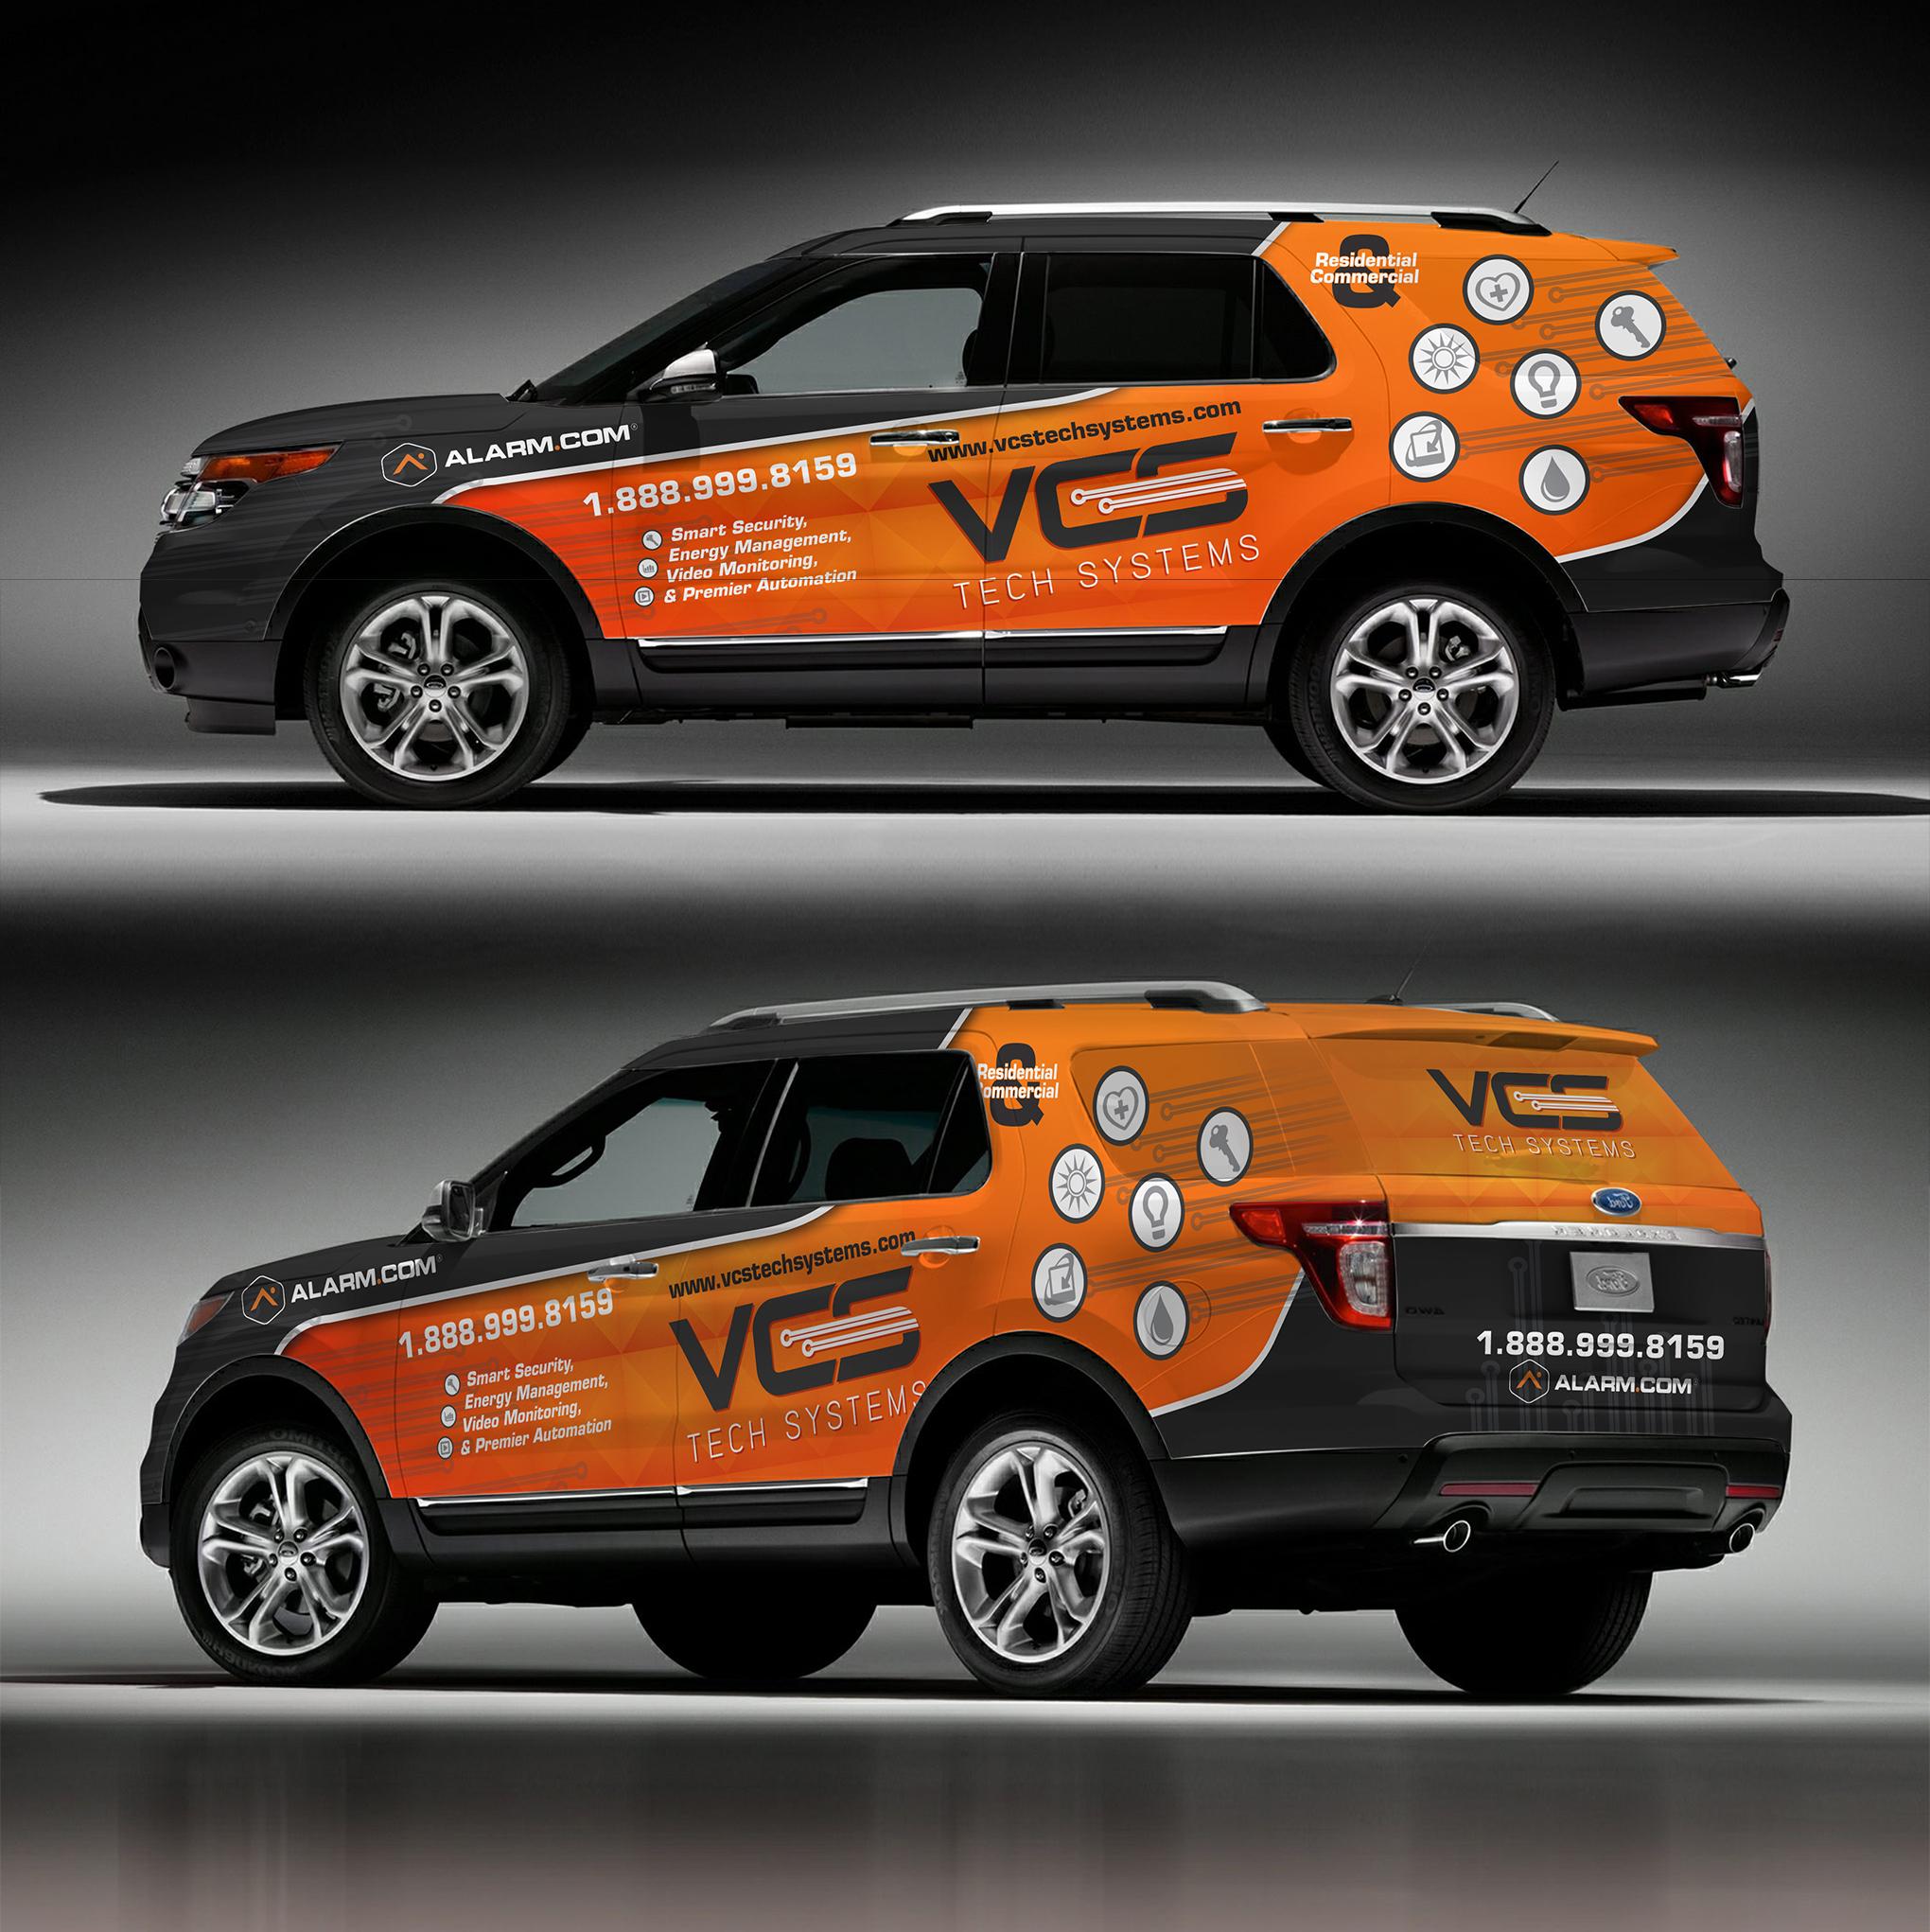 Pin By Serravision Photography On MetroEast Car Wrap Ideas